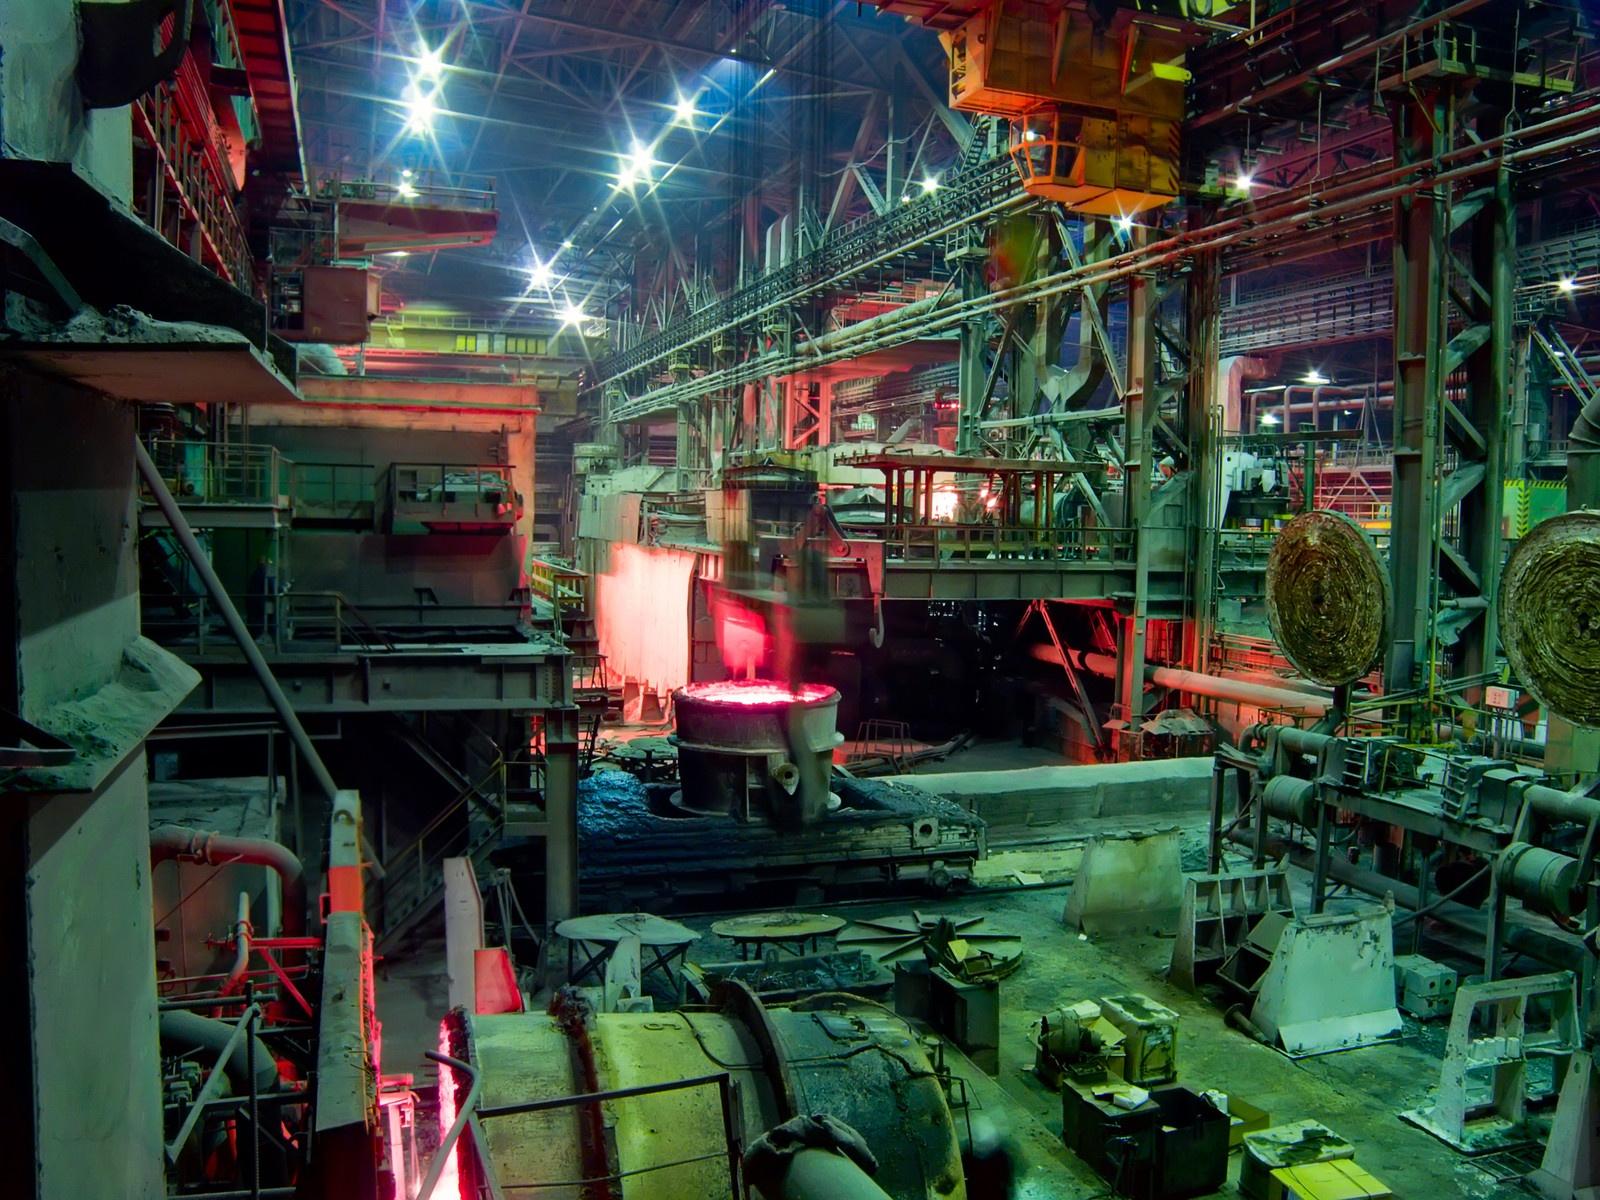 Industrial metallurgic plant in full operation